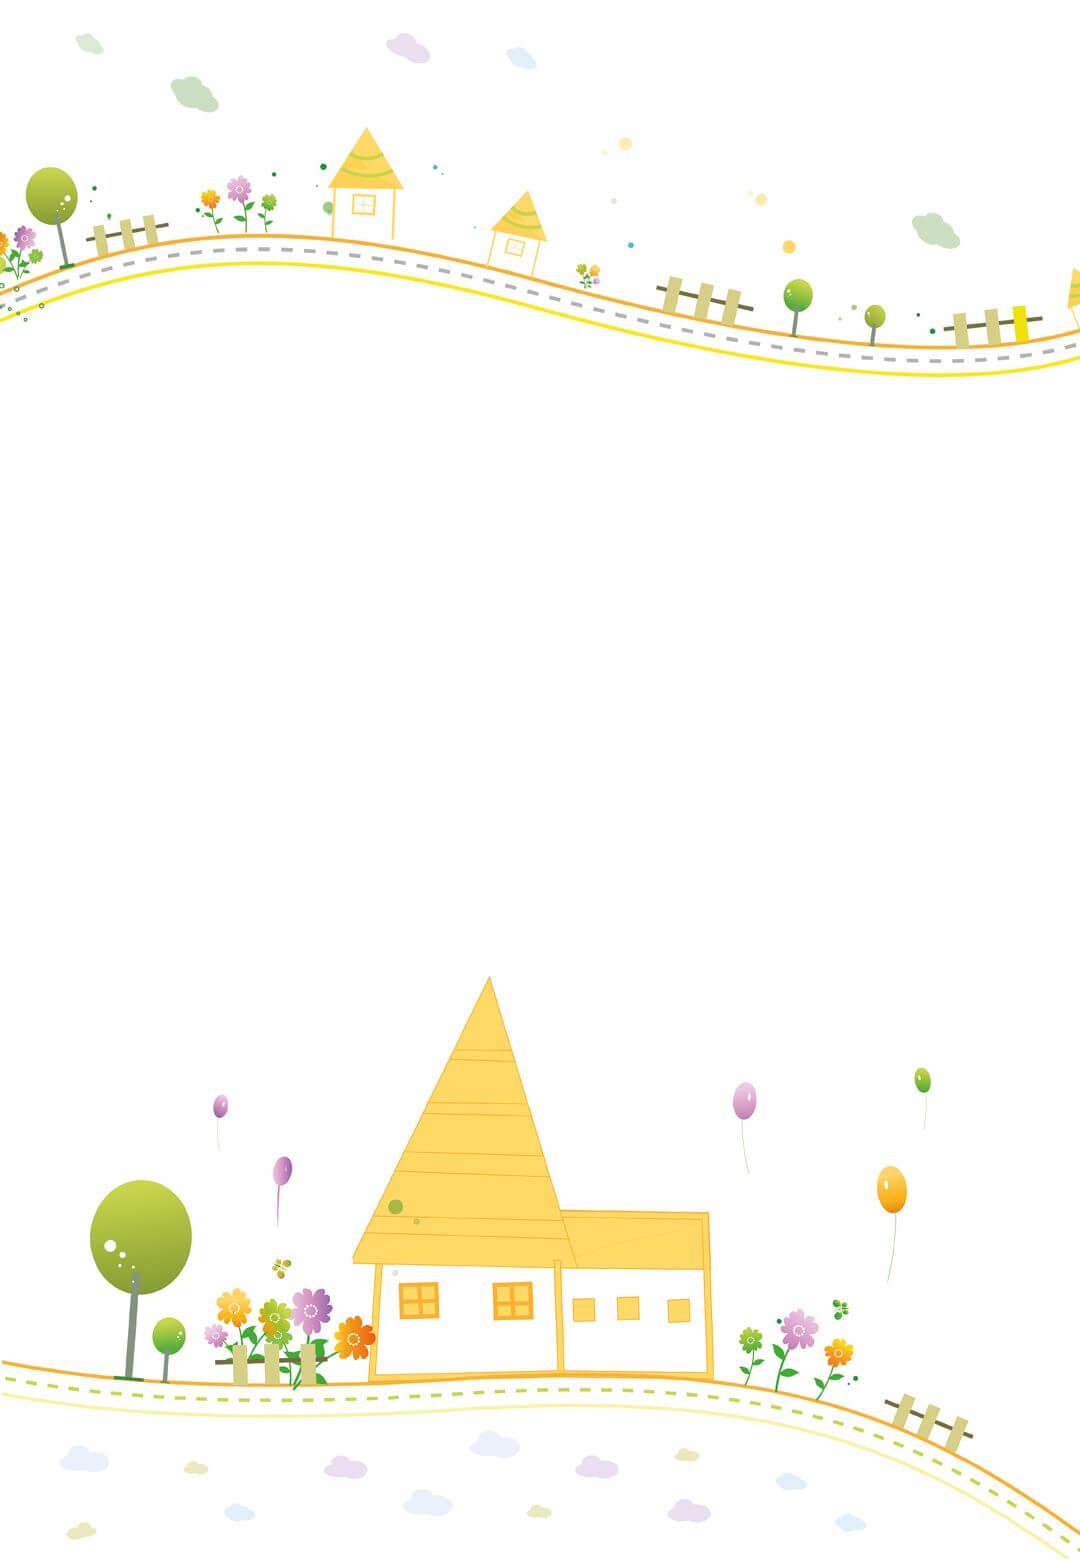 Housewarming Party - Housewarming Invitation Template (Free Within Free Housewarming Invitation Card Template